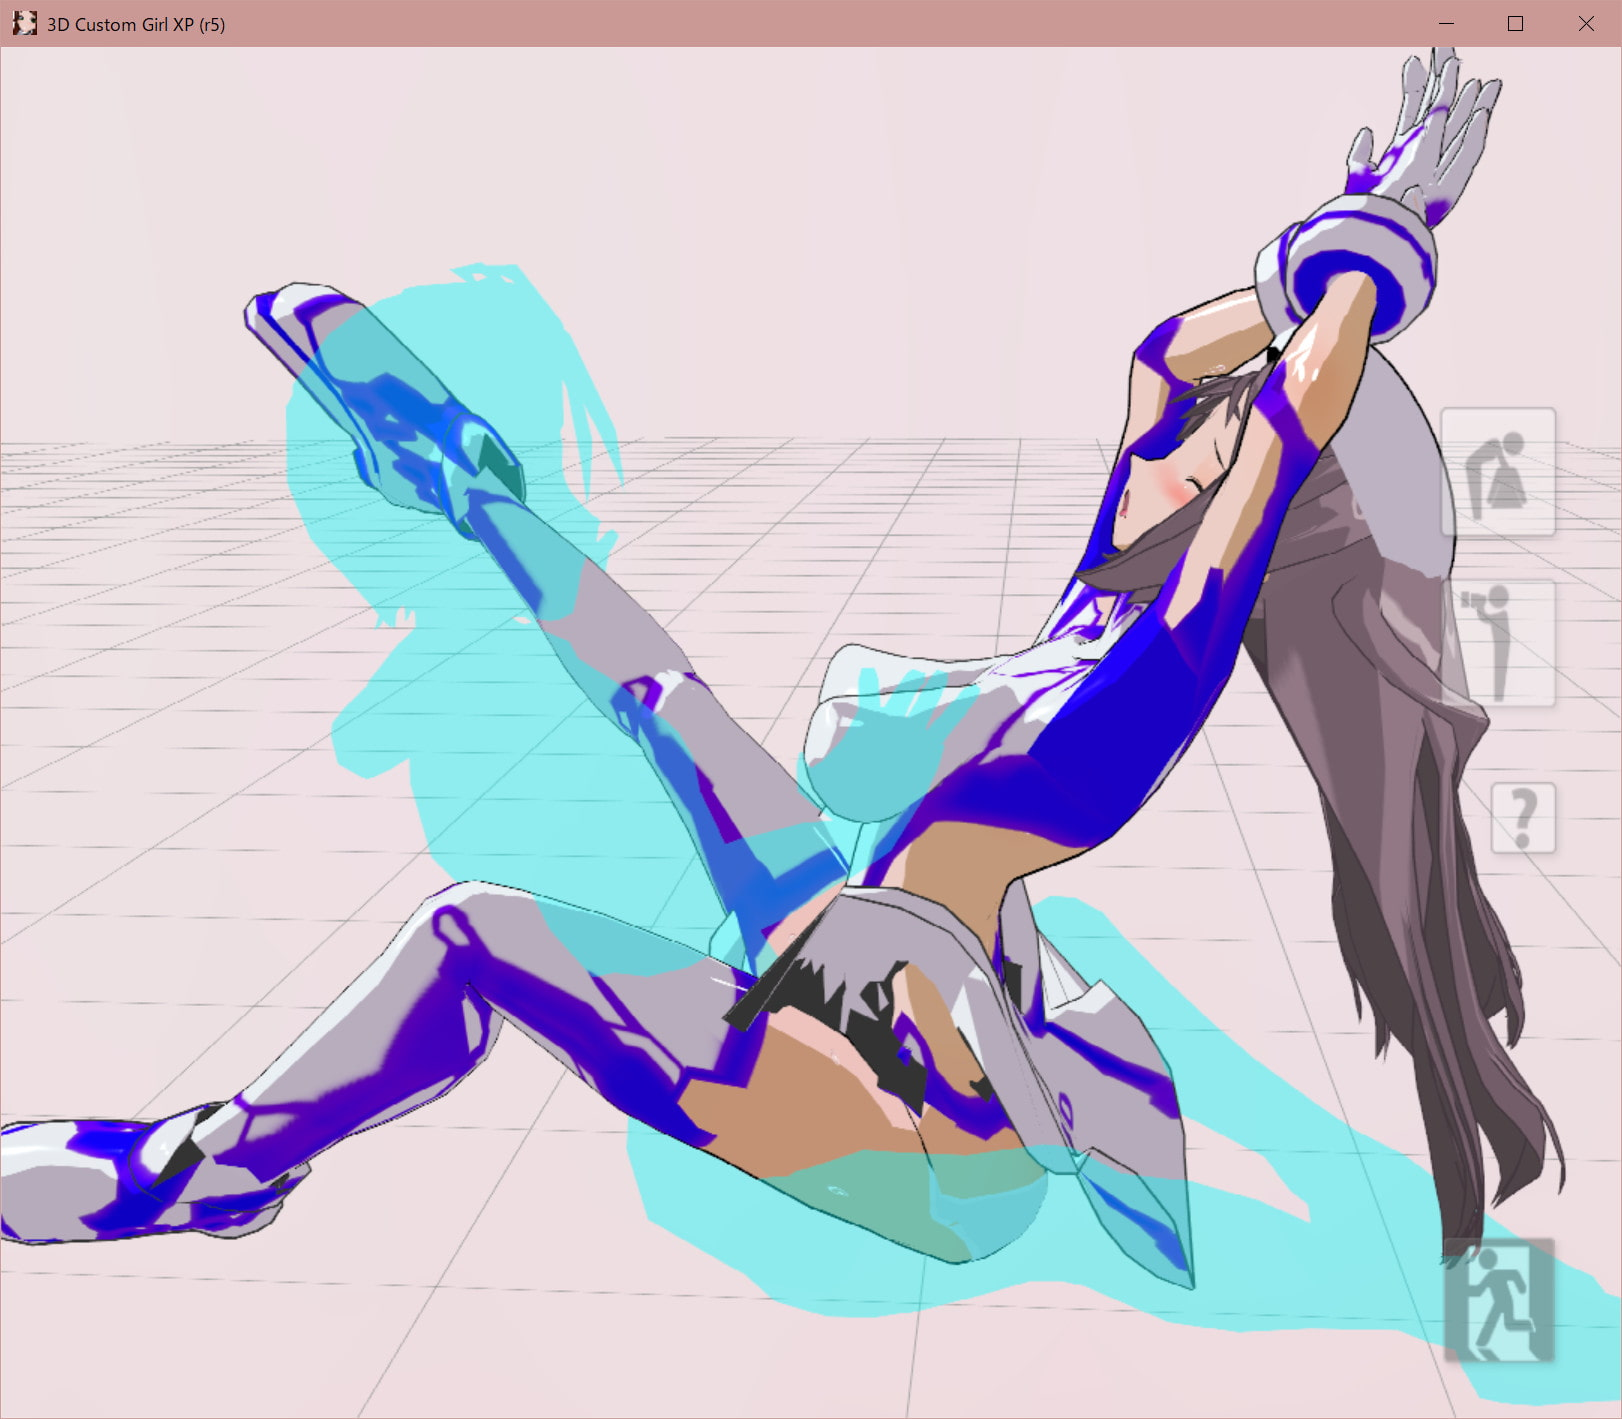 3Dカスタム少女追加モーション正常位smallpack1